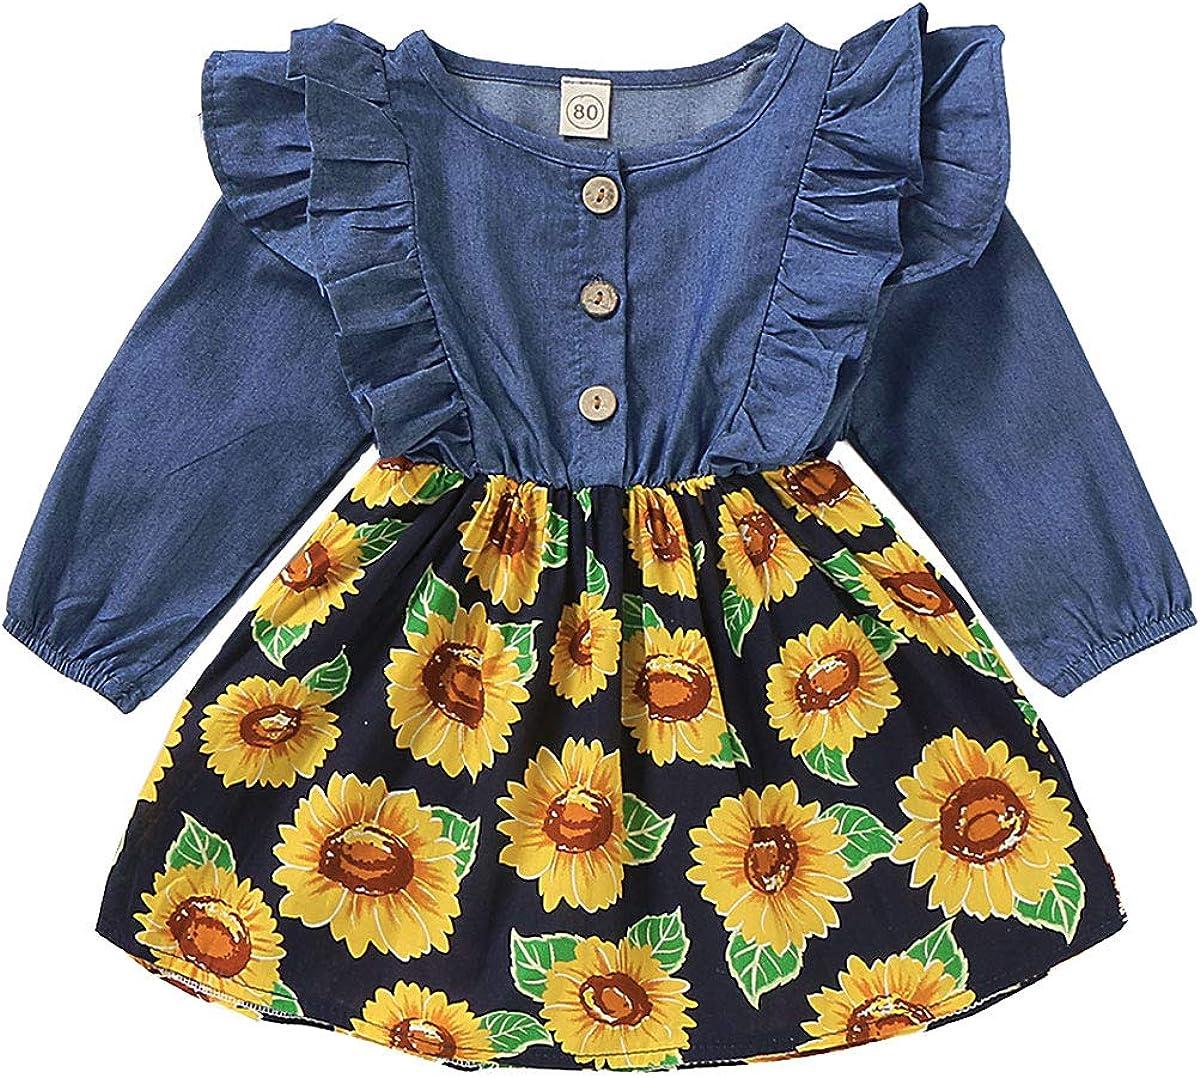 Baby Little Girls Denim Floral Sunflower Print Skirt Dresses Ruffled Long Sleeves Princess Party Wedding Flower Dresses